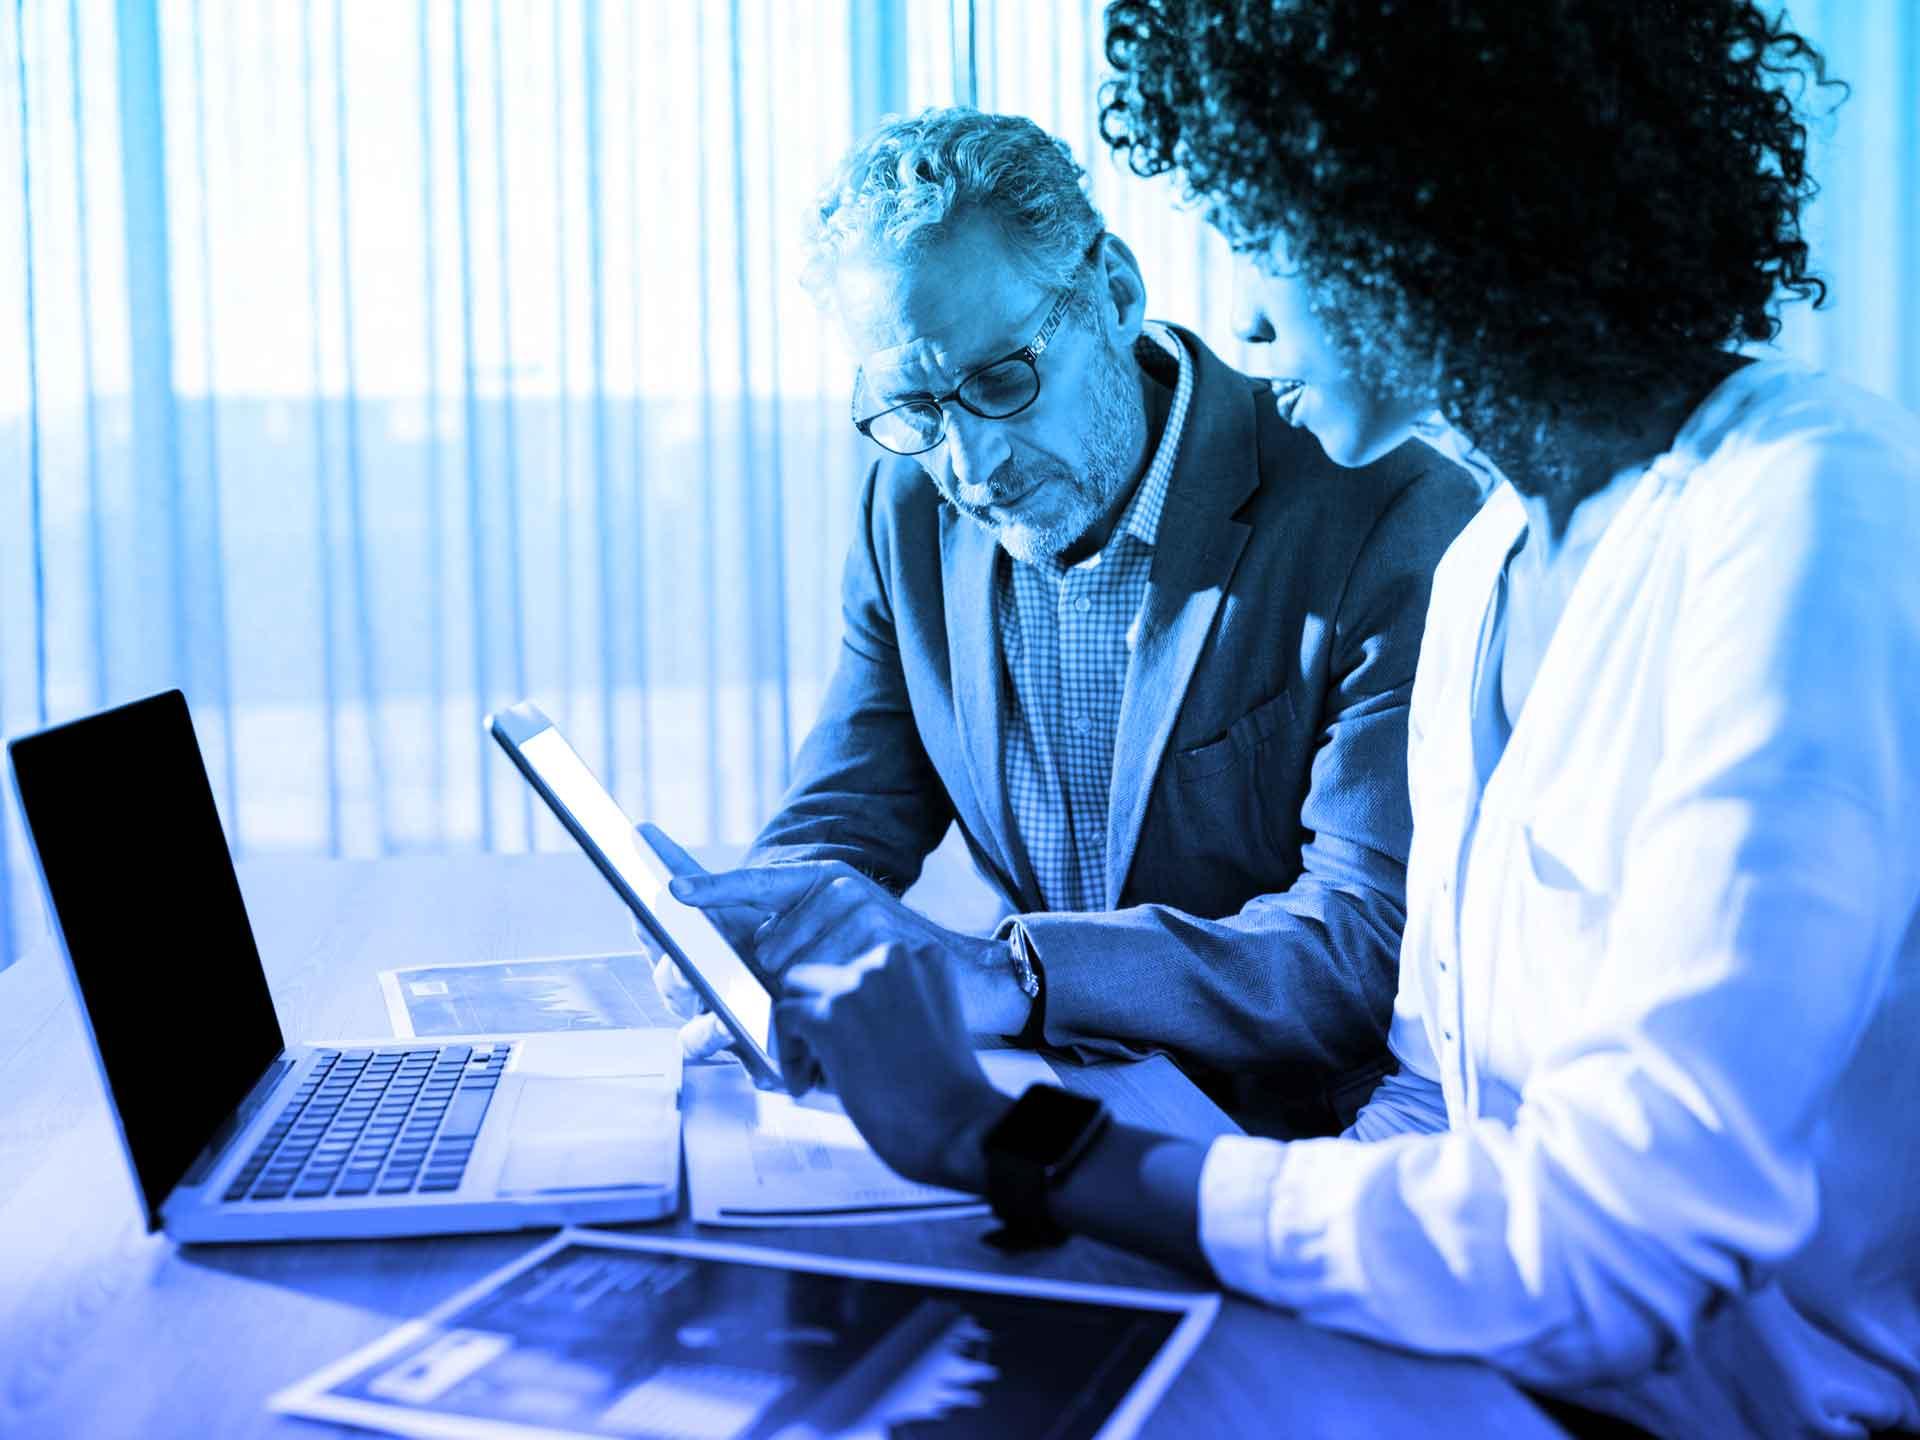 Betere klantenservice met Microsoft Dynamics 365 Business Central.